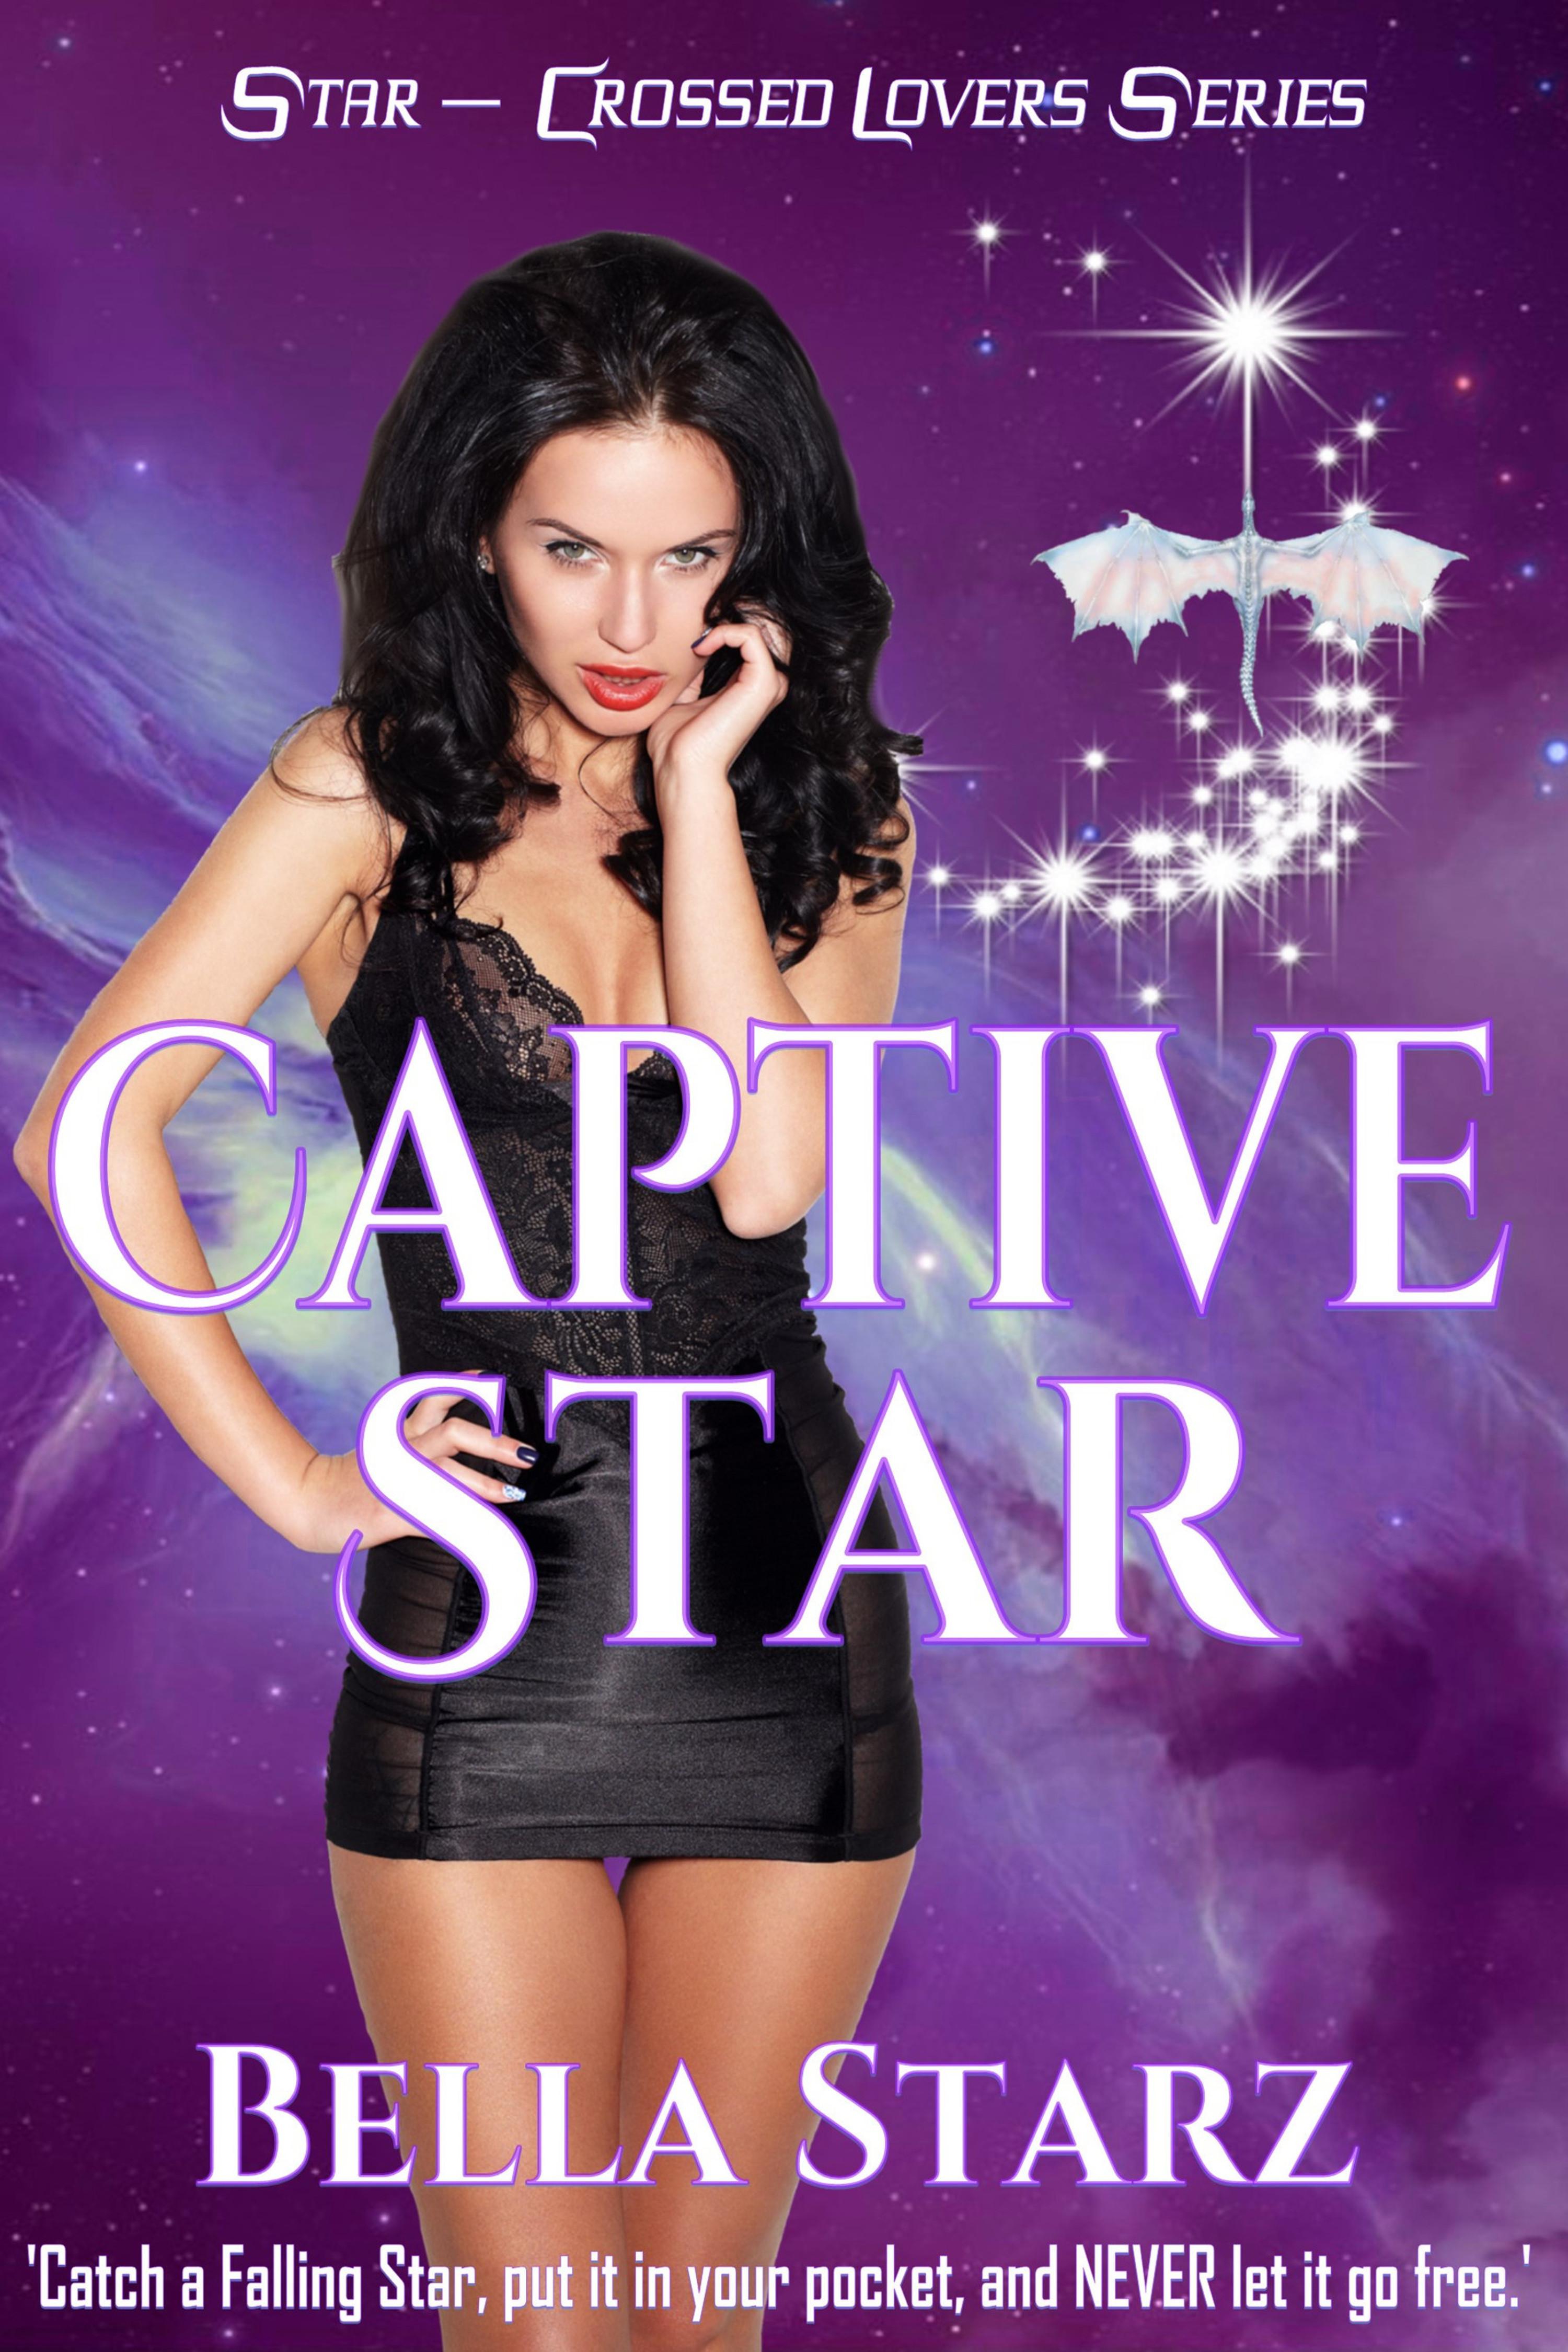 CaptiveStarCover